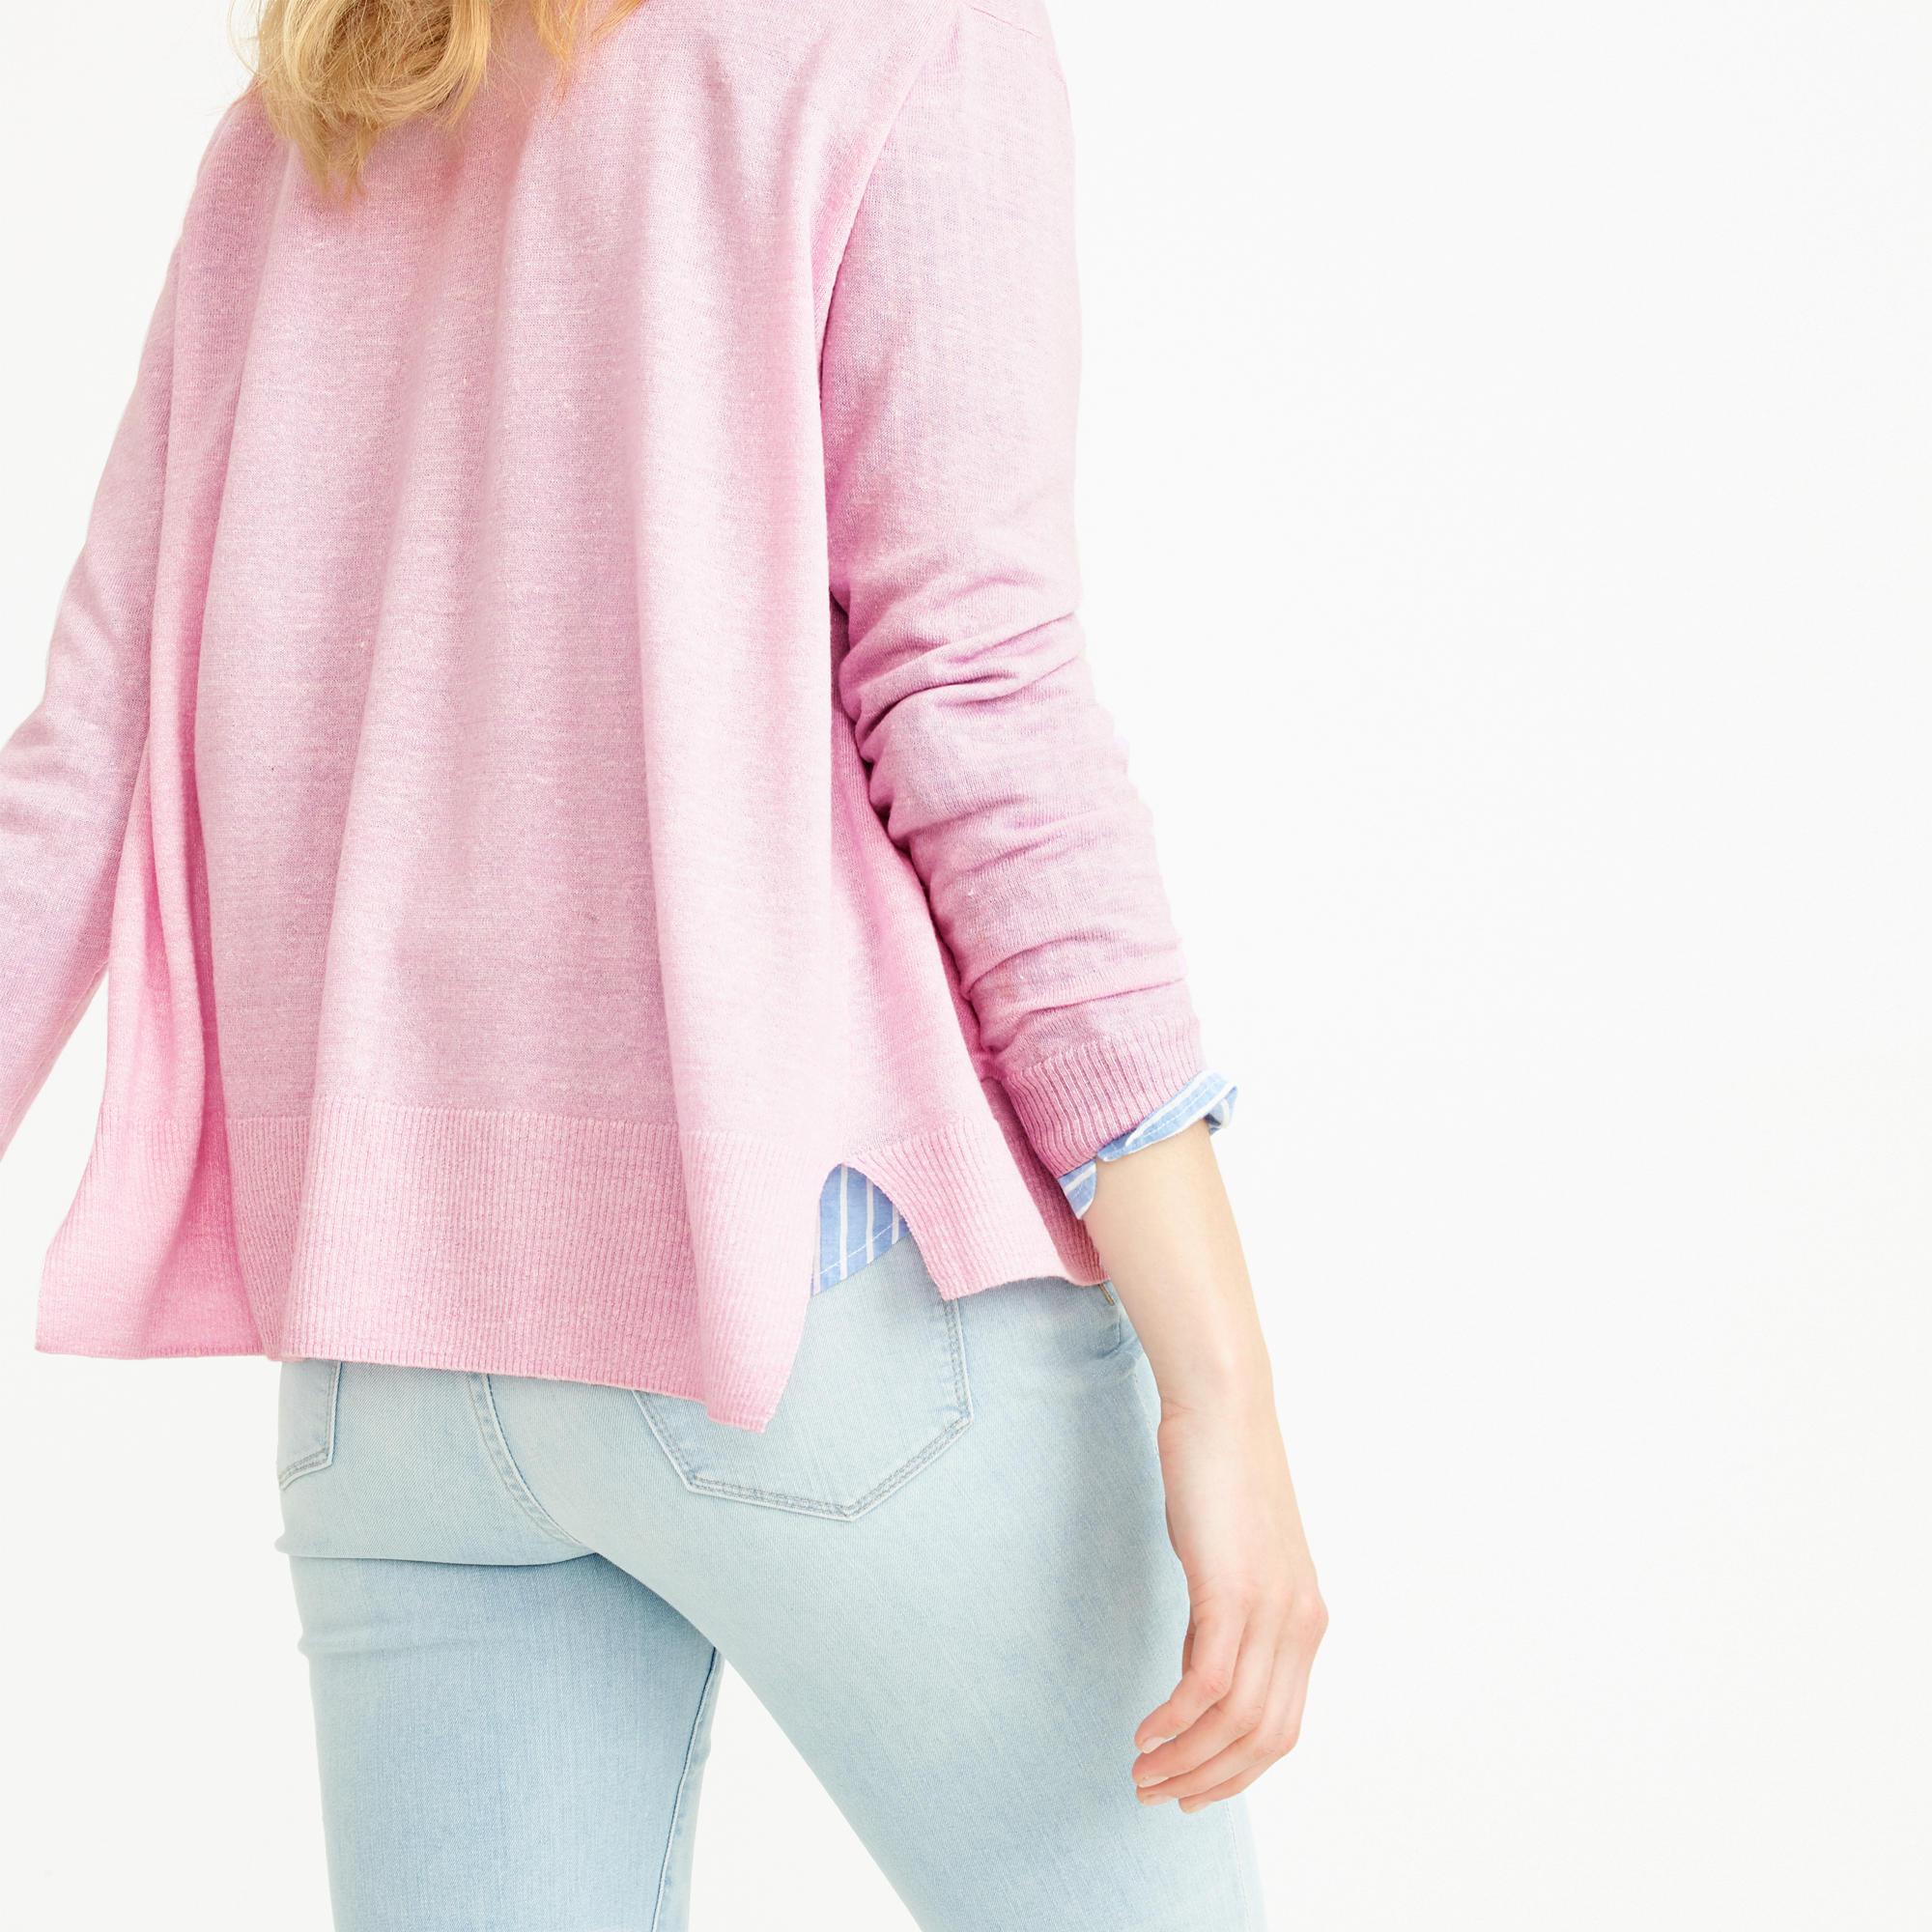 J.crew Merino Linen V-neck Cardigan Sweater in Pink | Lyst